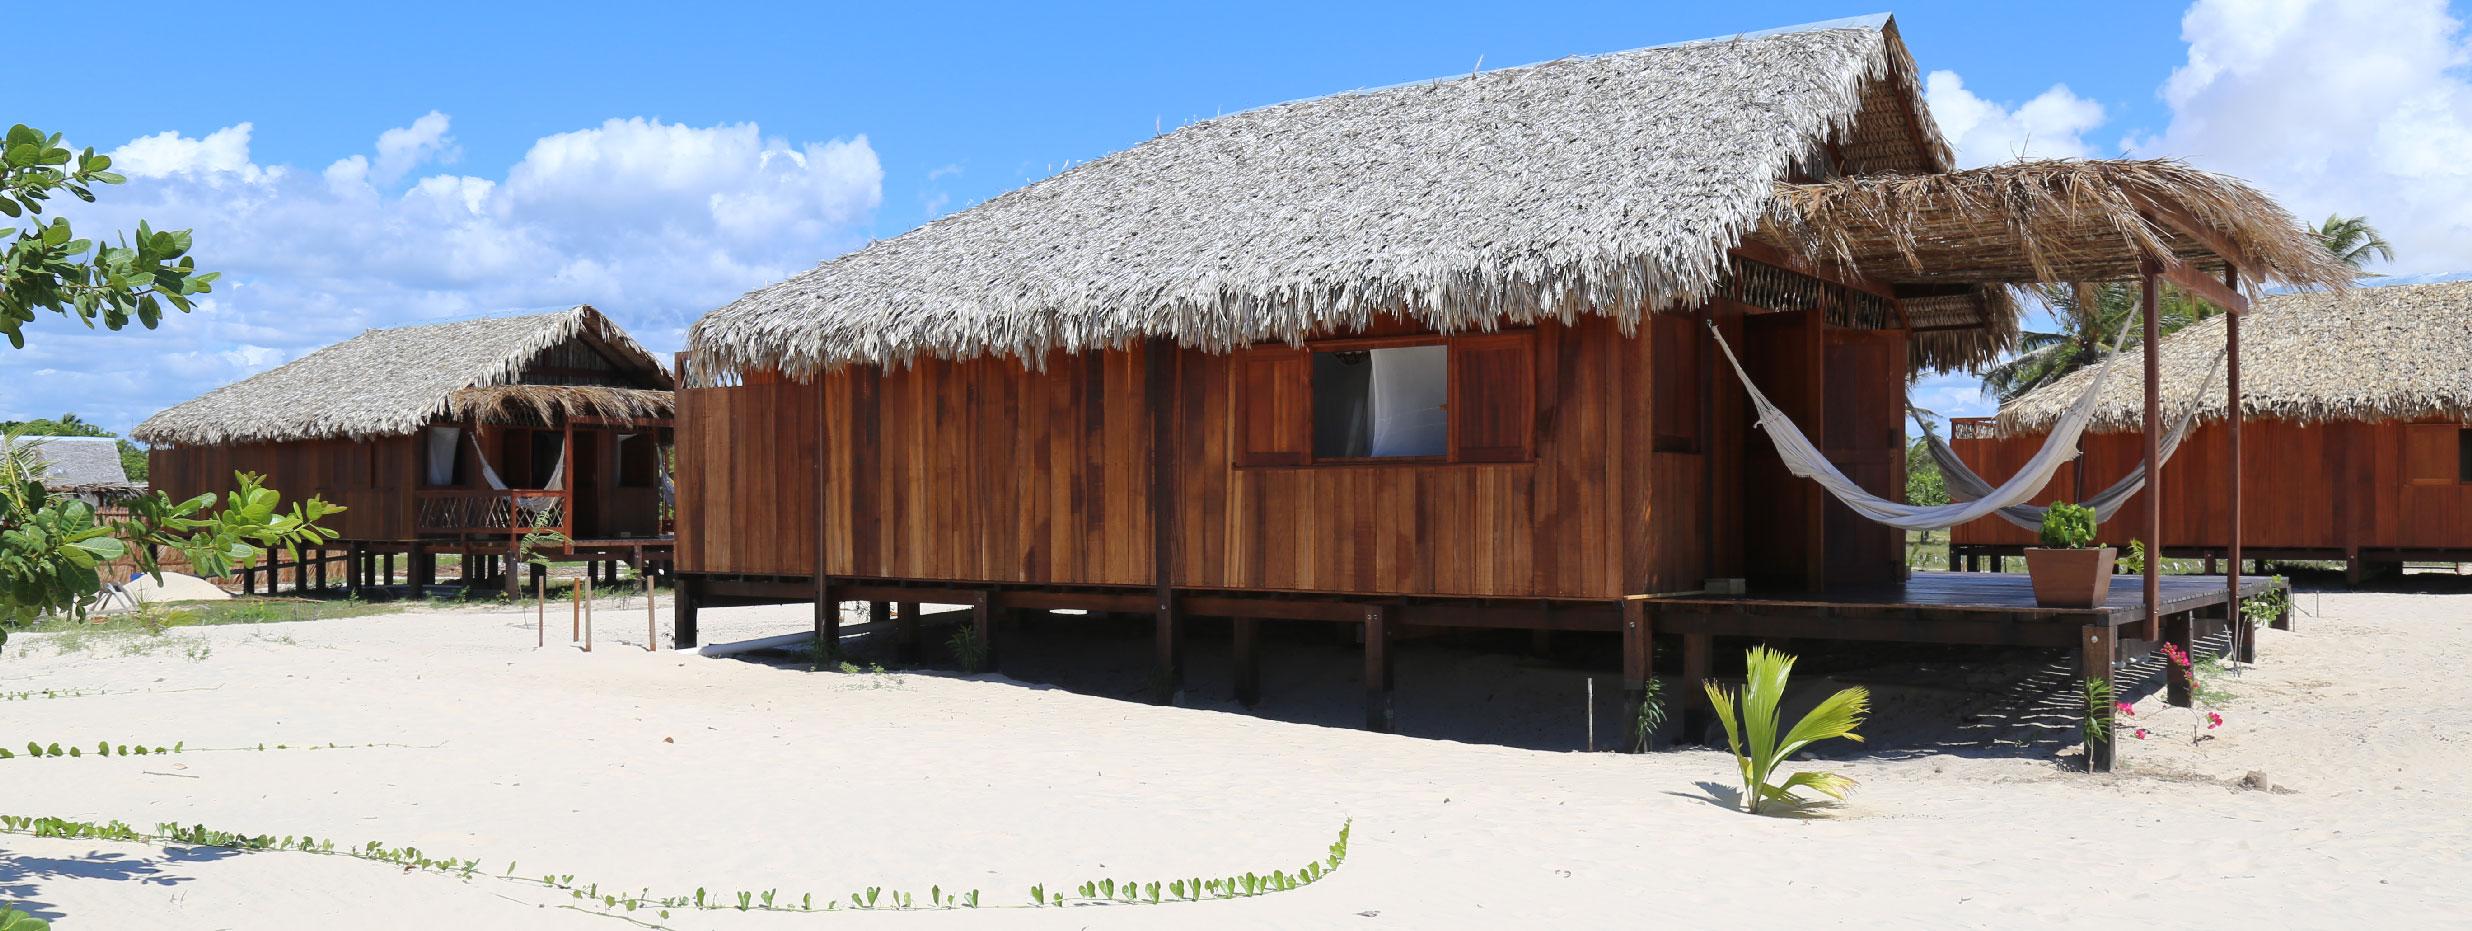 the acomodations of vila guara